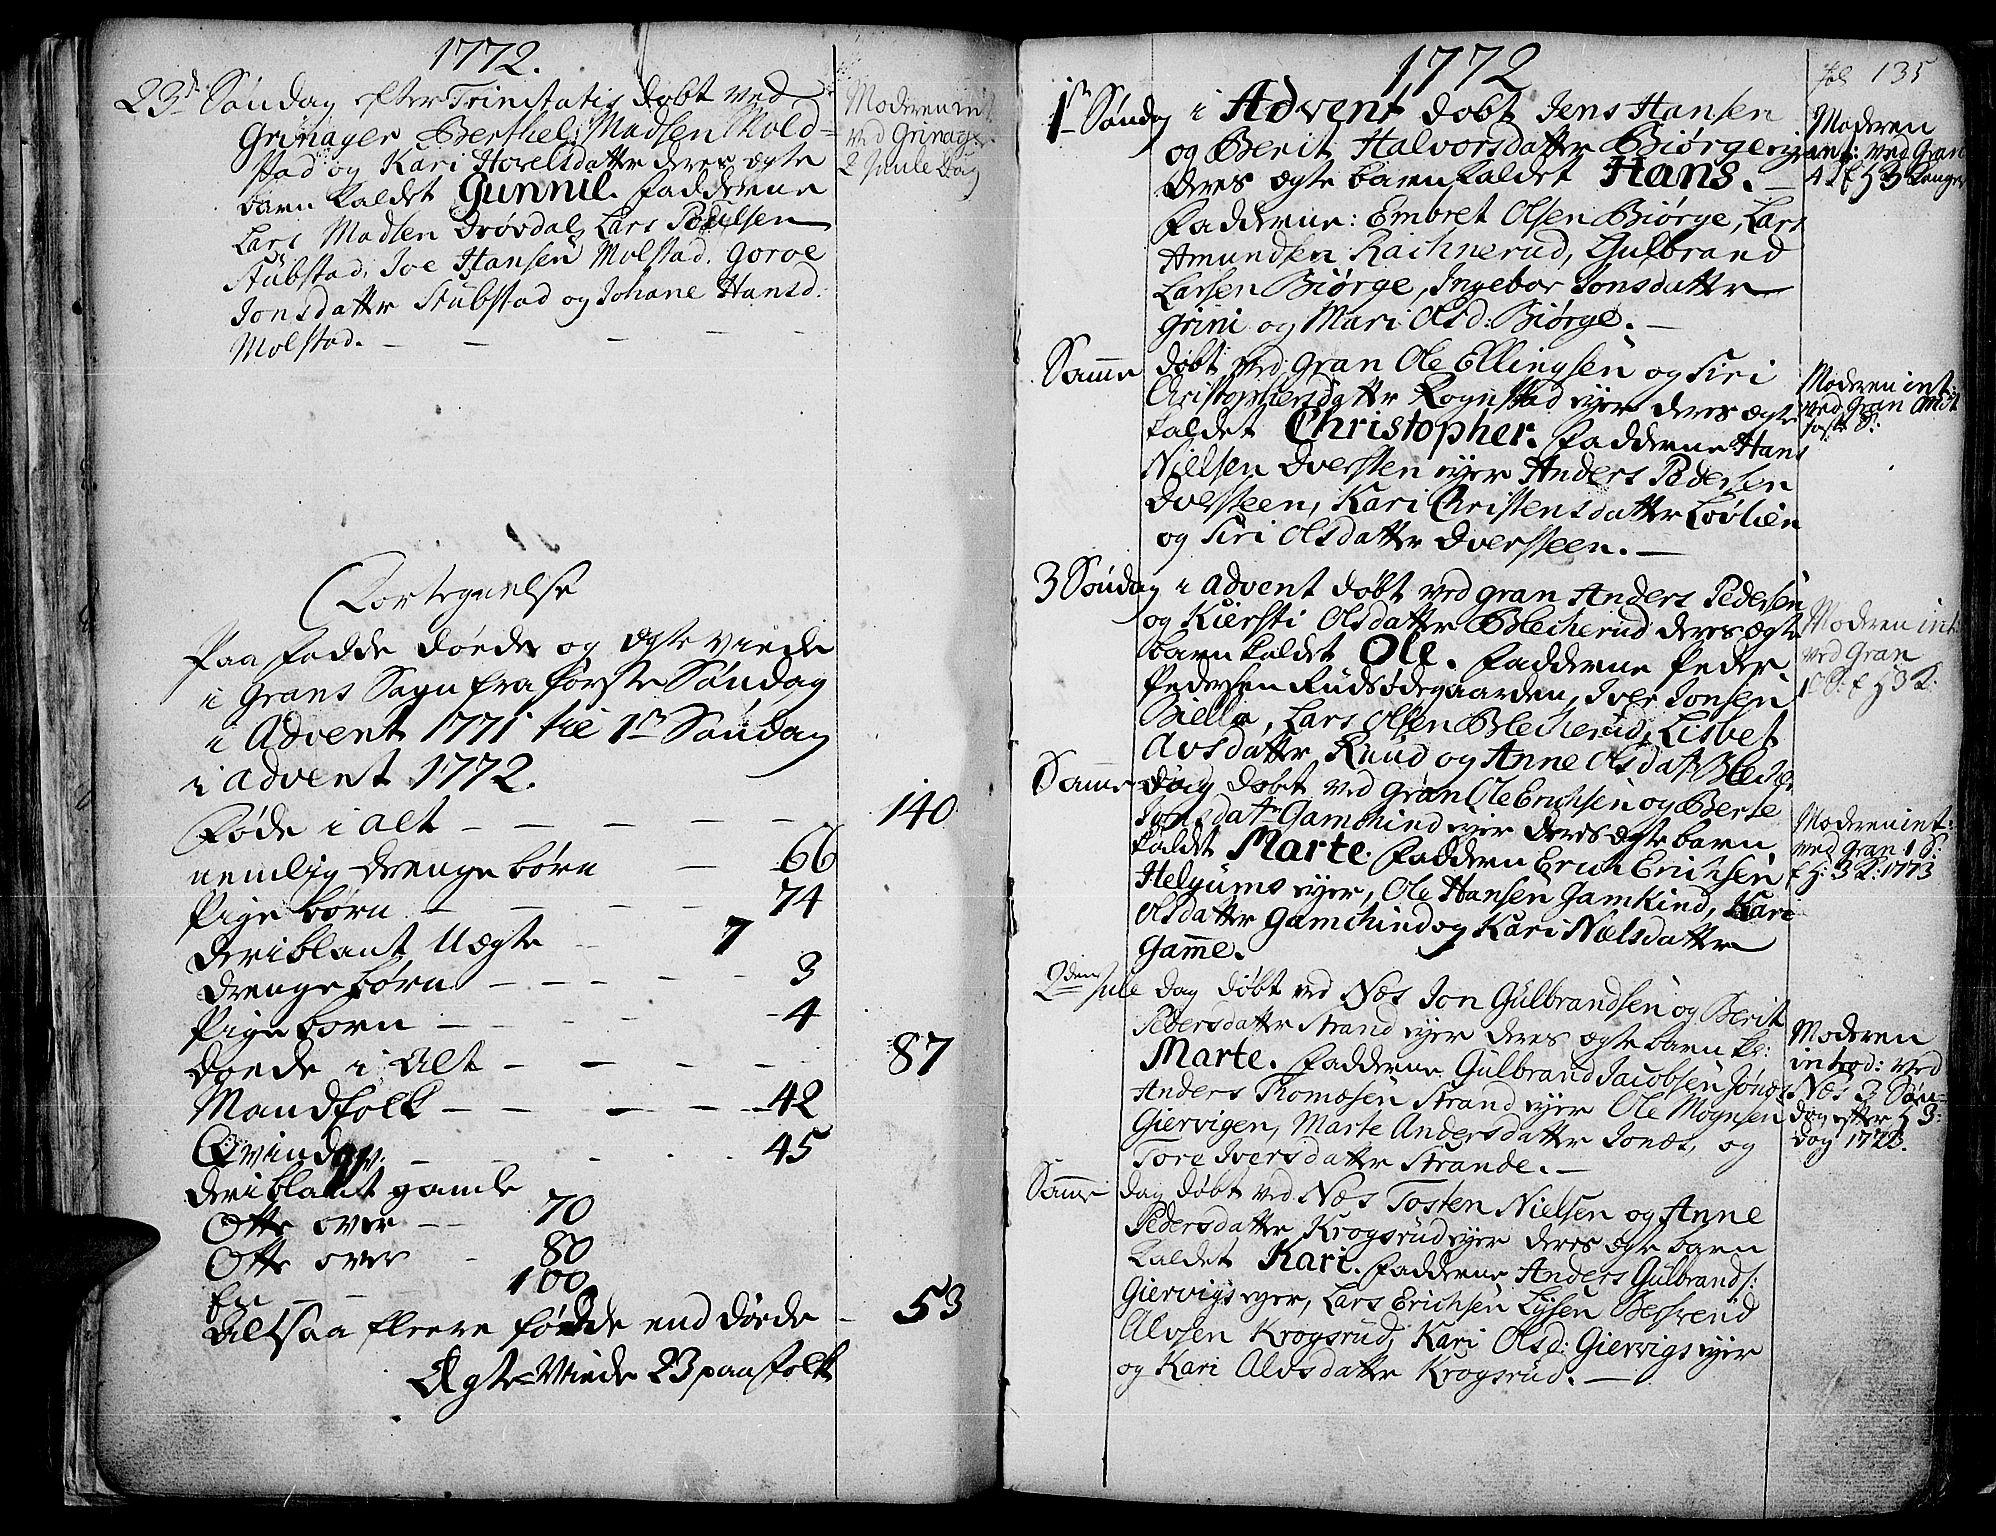 SAH, Gran prestekontor, Ministerialbok nr. 4, 1759-1775, s. 135